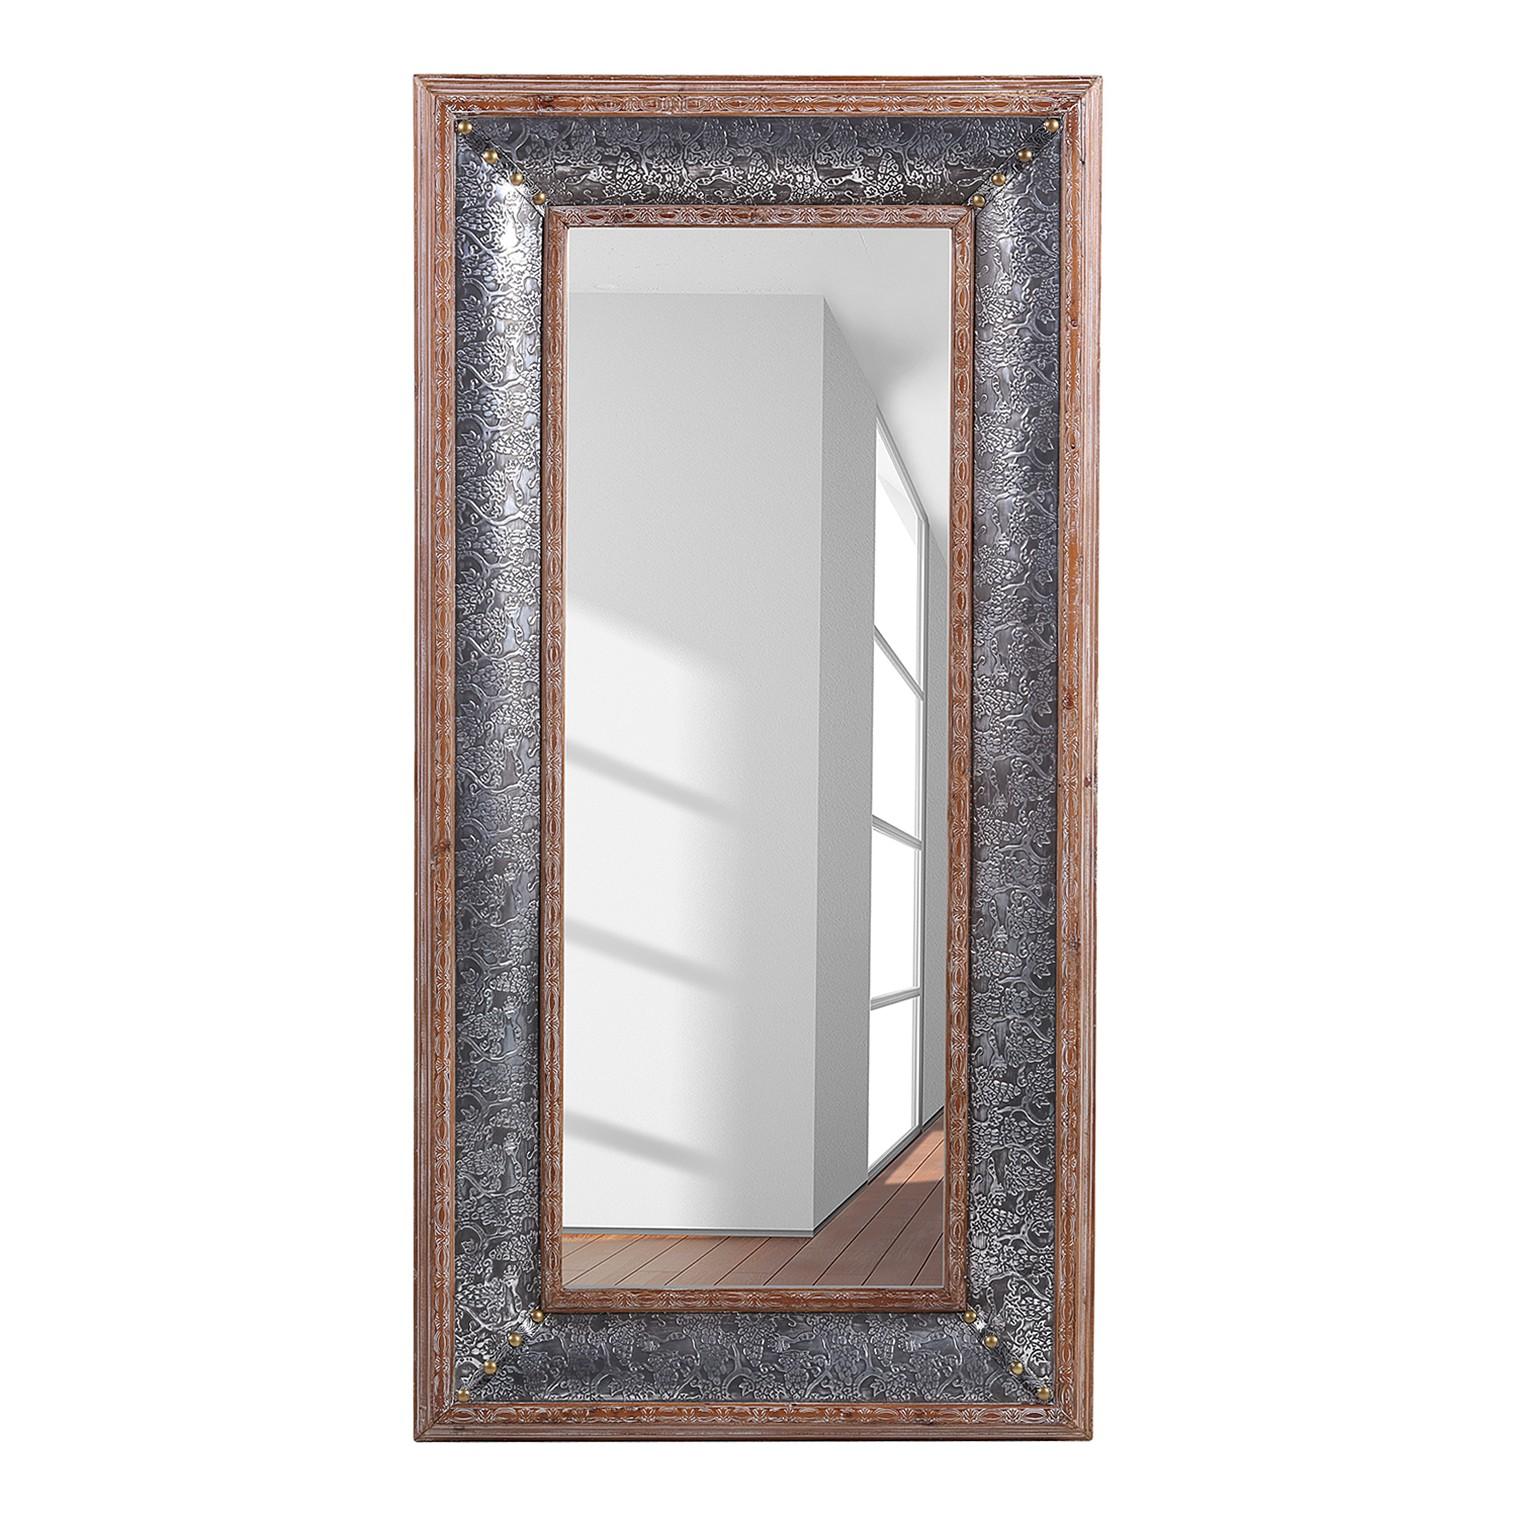 M bel spiegel yanbu tanne massiv aluminium tanne for Polir aluminium miroir